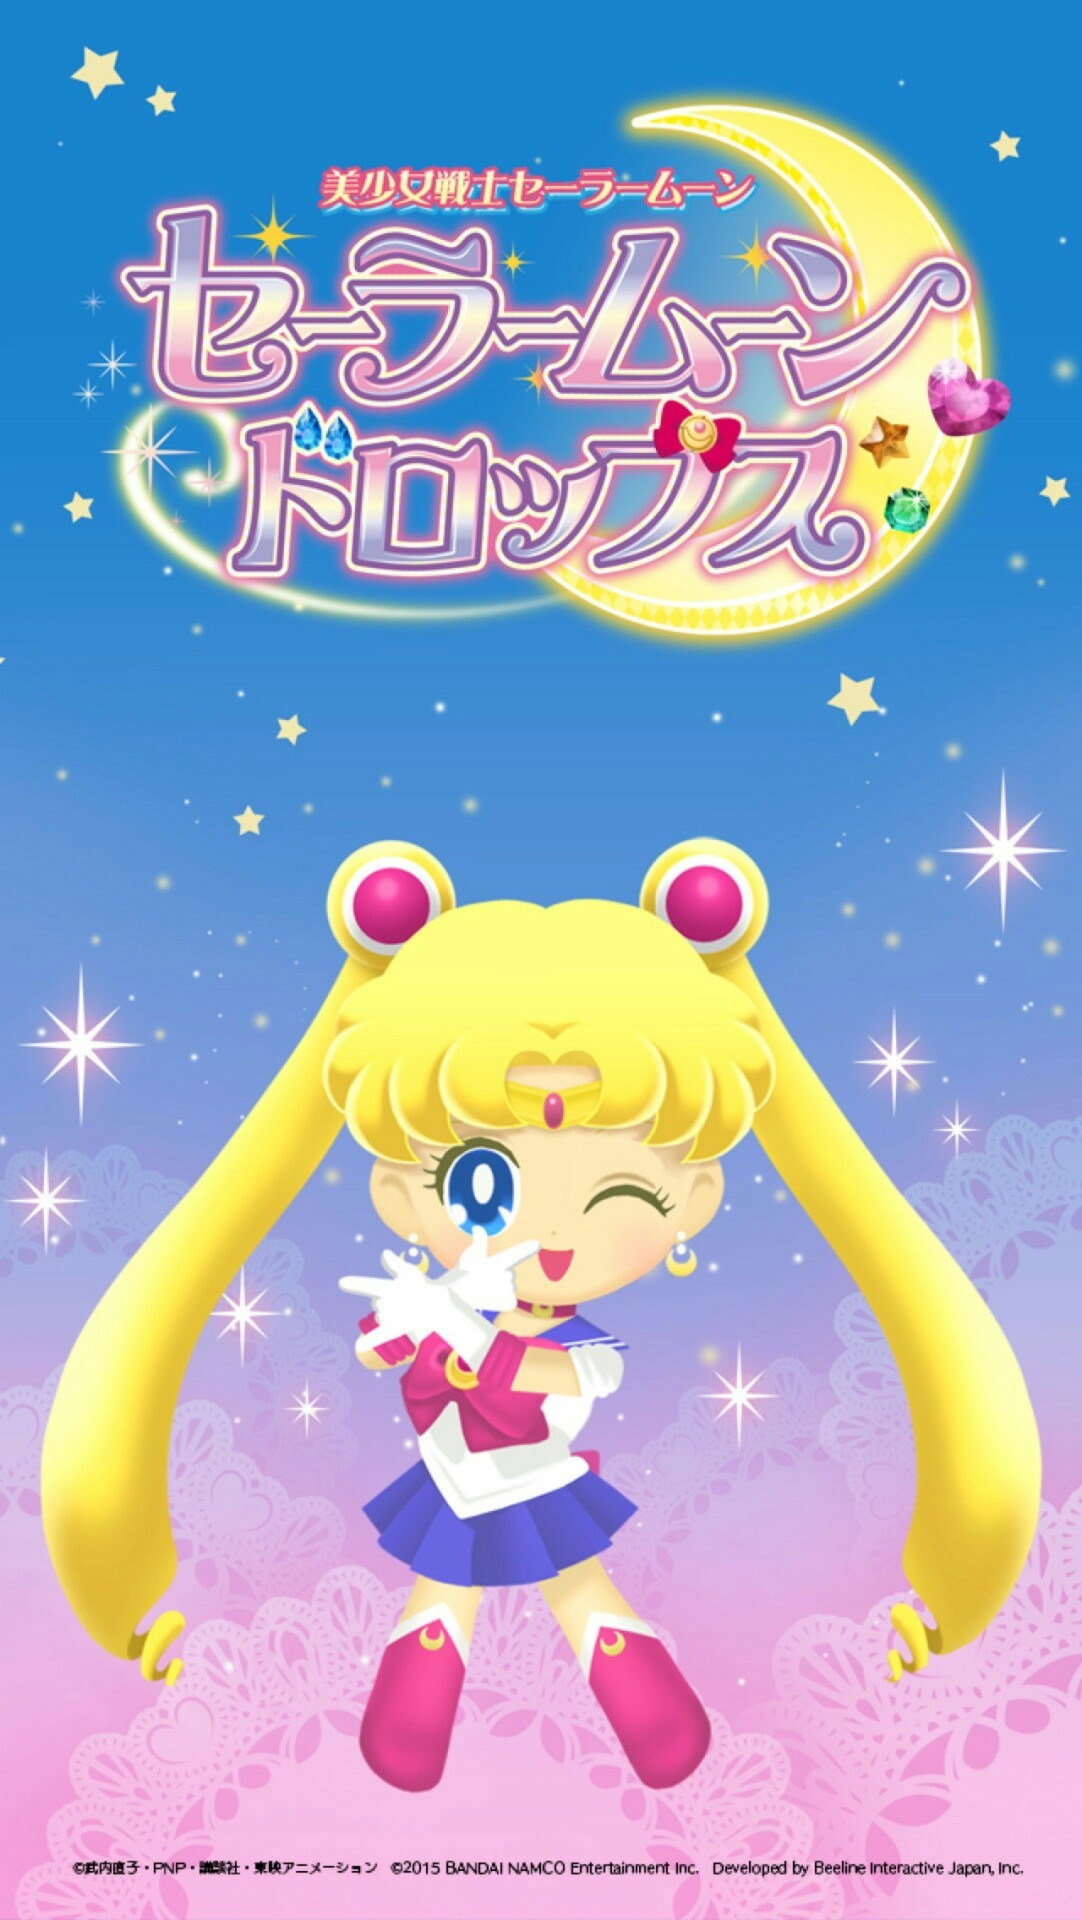 Sailor Moon Games, Sailor Moon Crystal, Sailors, American Version, 25th  Anniversary, Wallpapers, Chibi, Fanart, Android